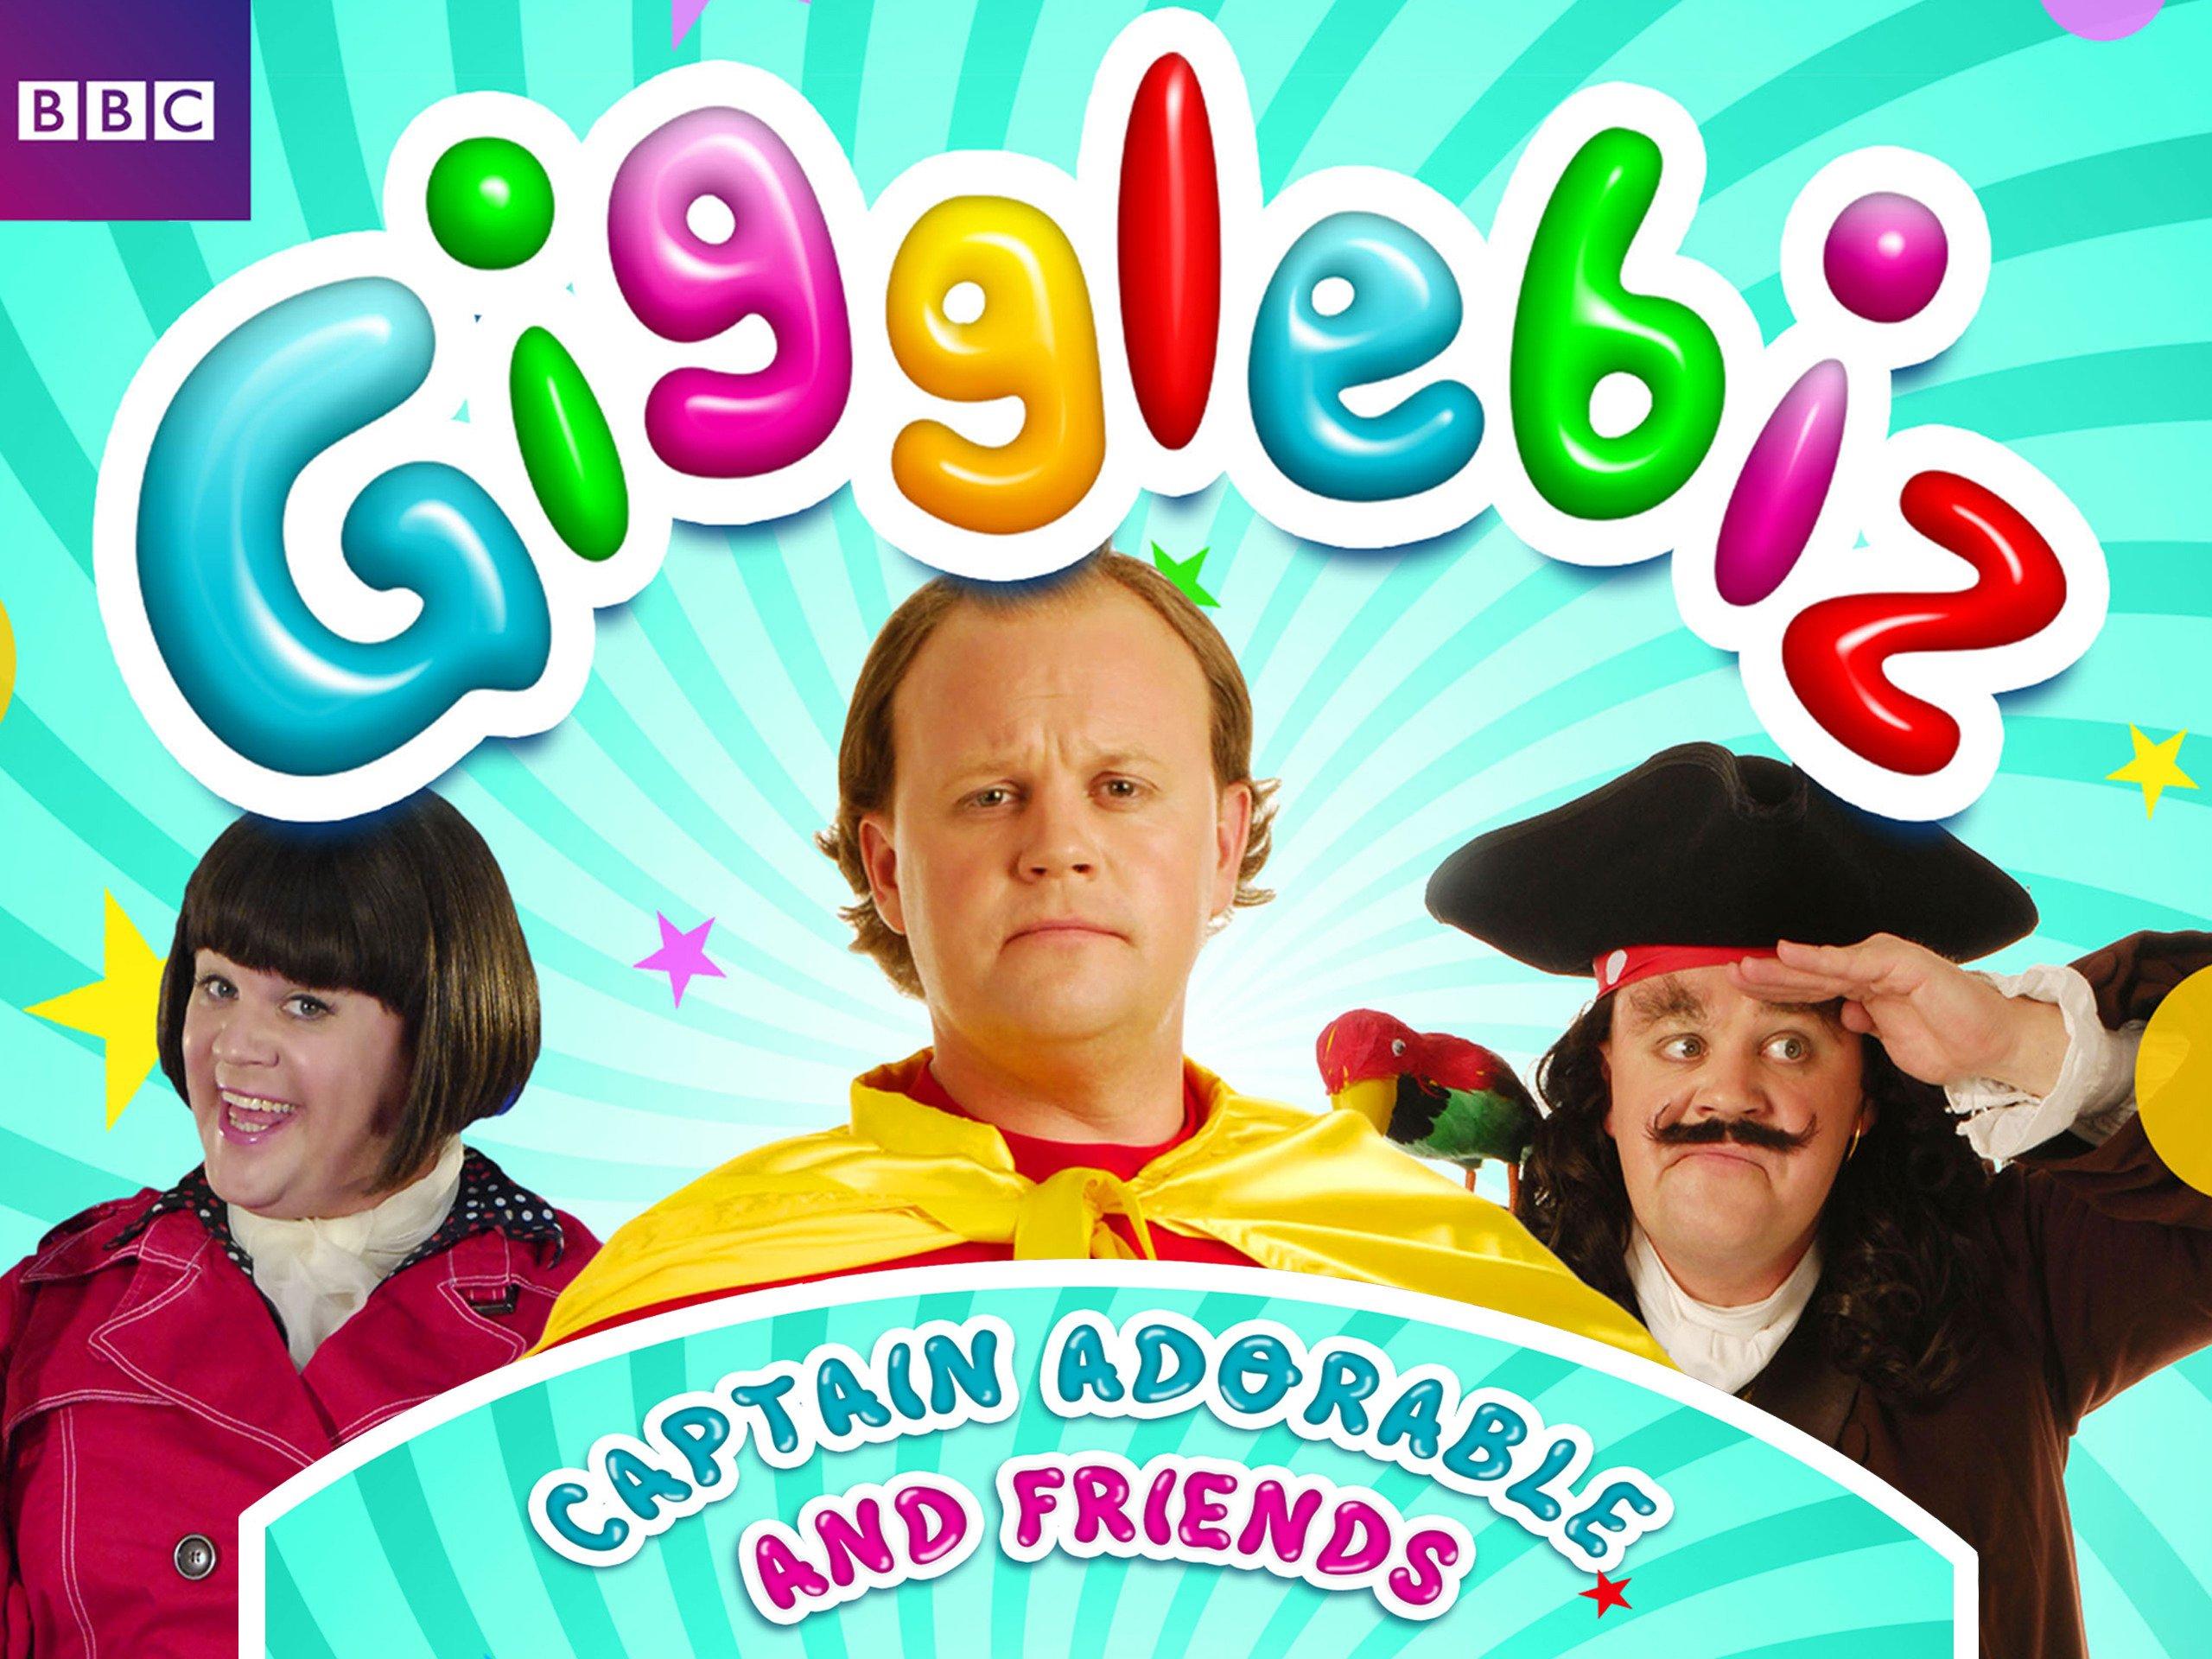 Gigglebiz: Captain Adorable and Friends - Season 1